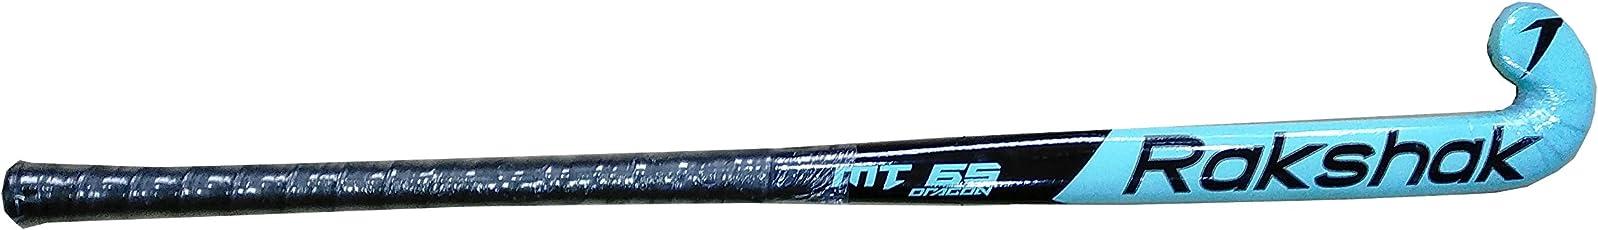 Rakshak Dragon Wooden Composite Painted Hockey Stick having Carbon Black Touch - Full Size